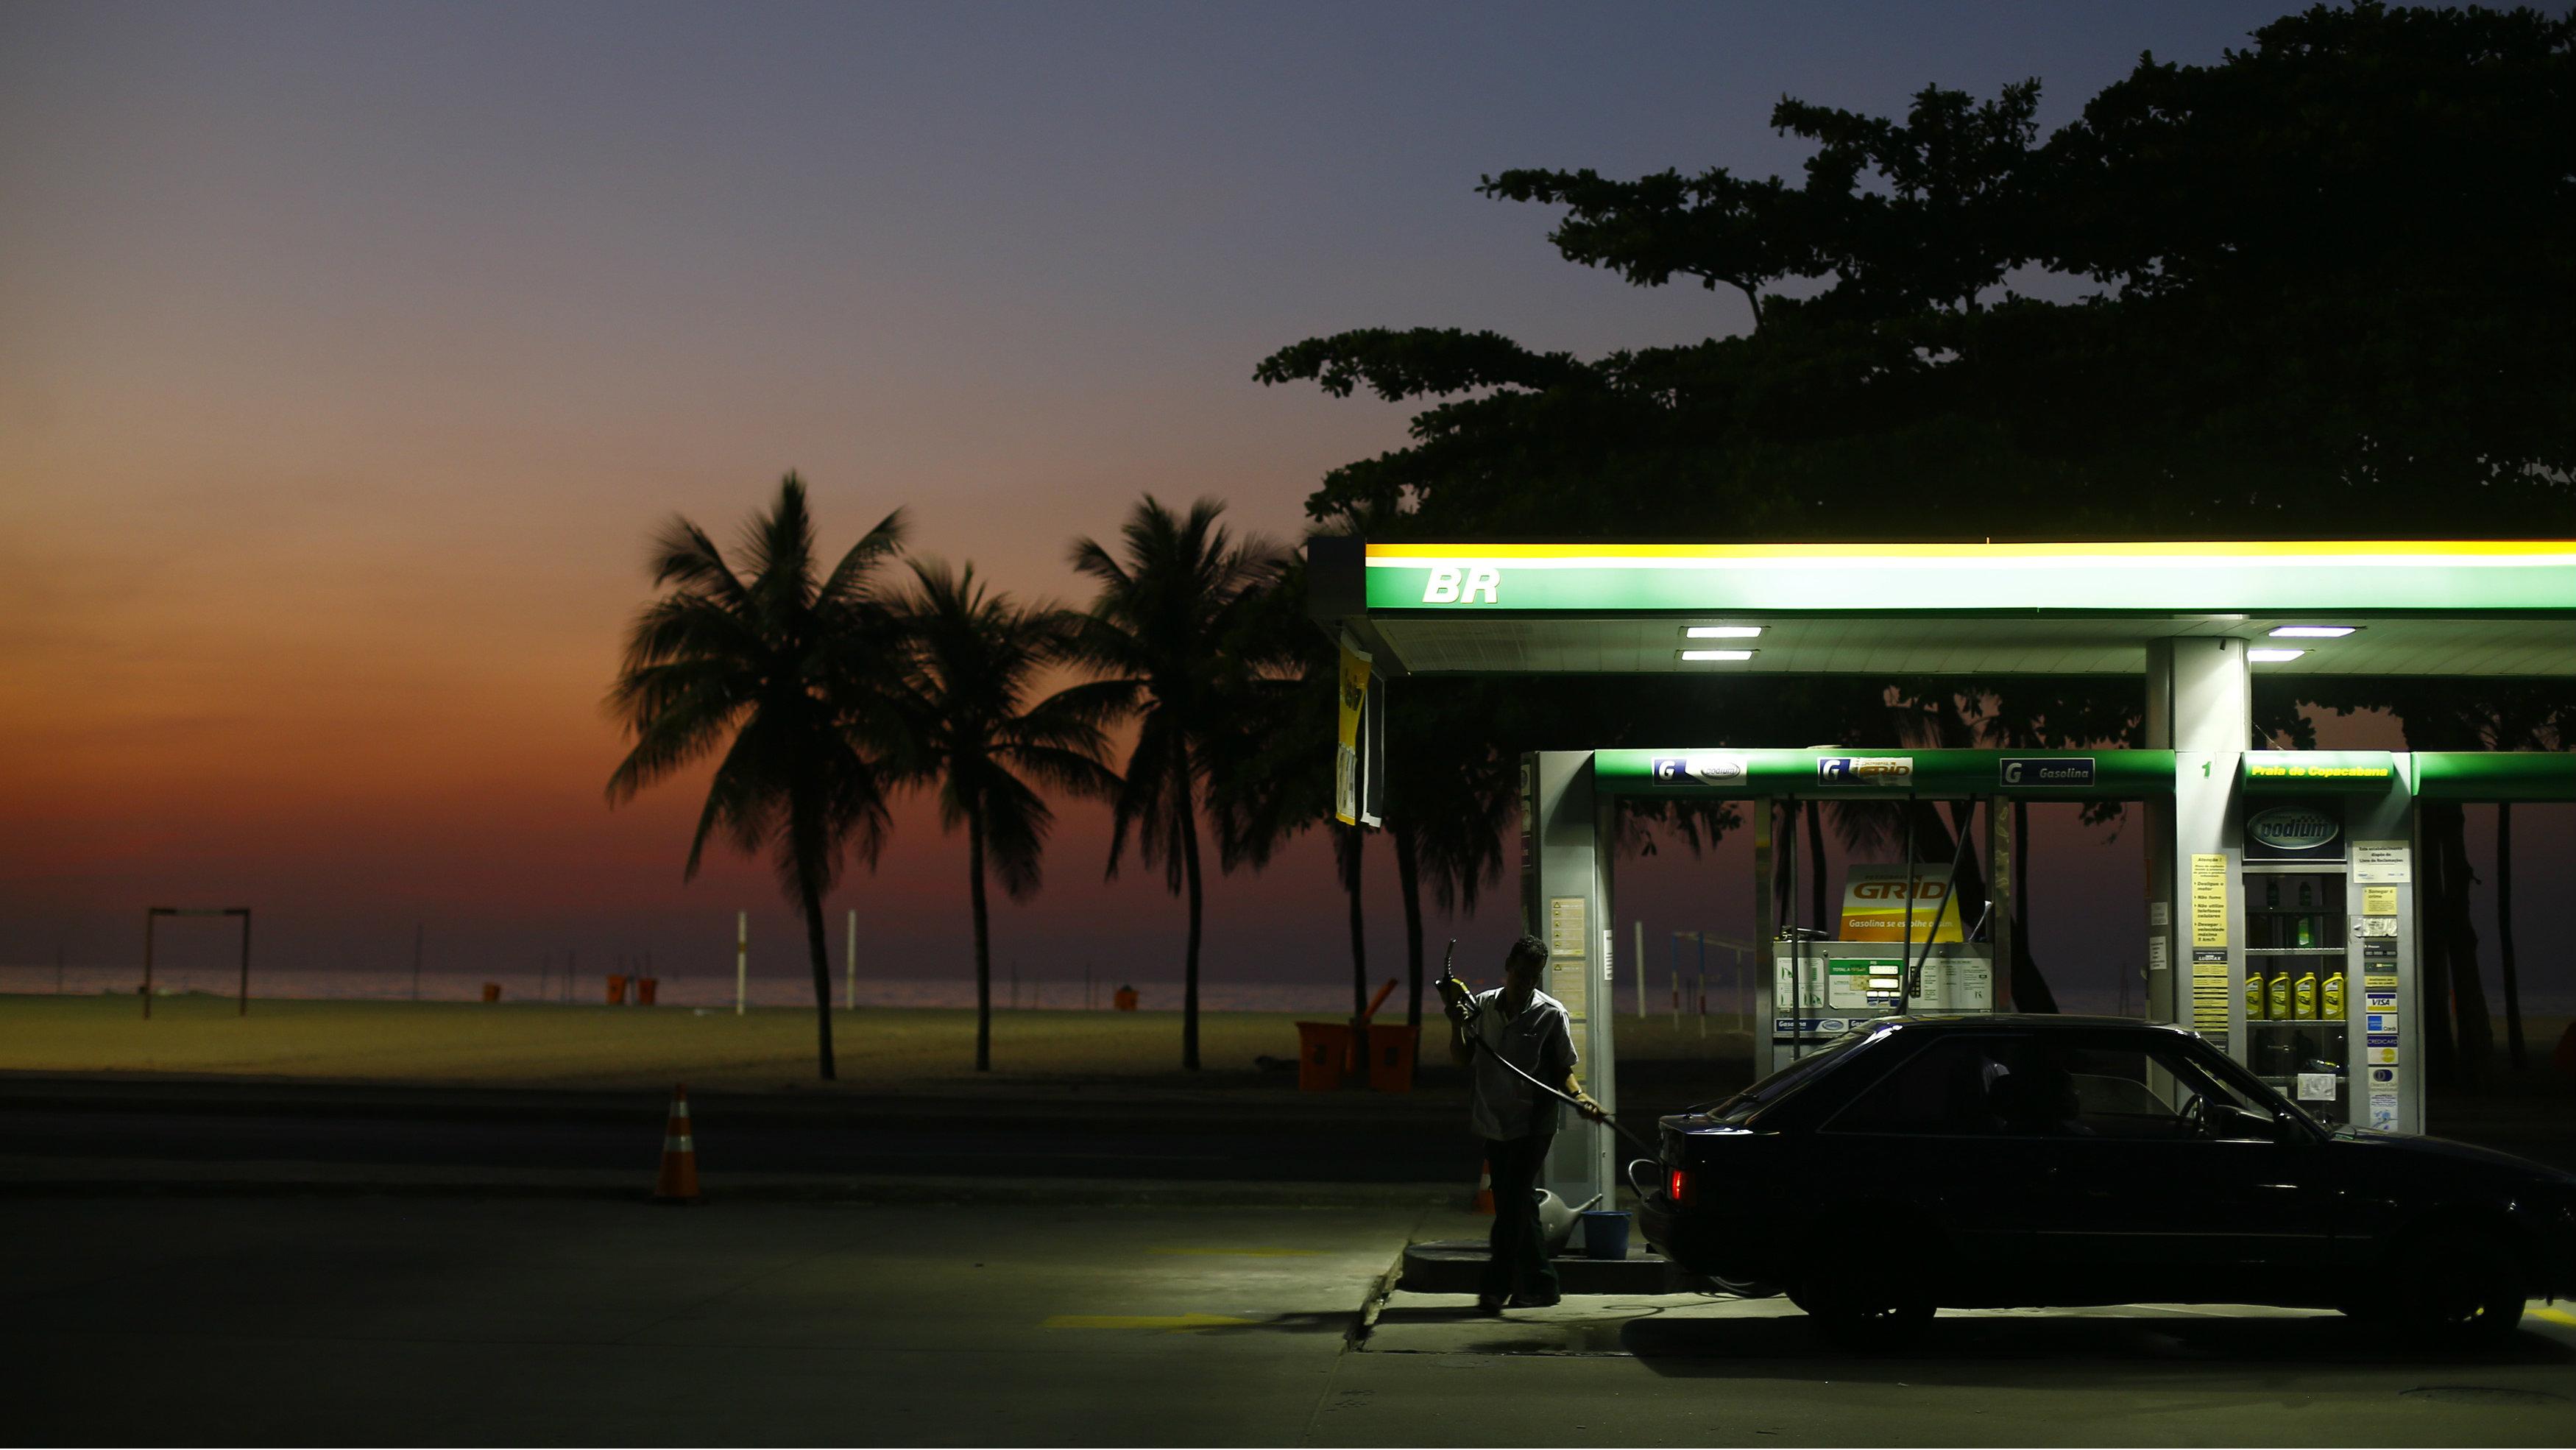 A worker prepares to fill a car at a gas station close to Copacabana beach in Rio de Janeiro, January 12, 2015.